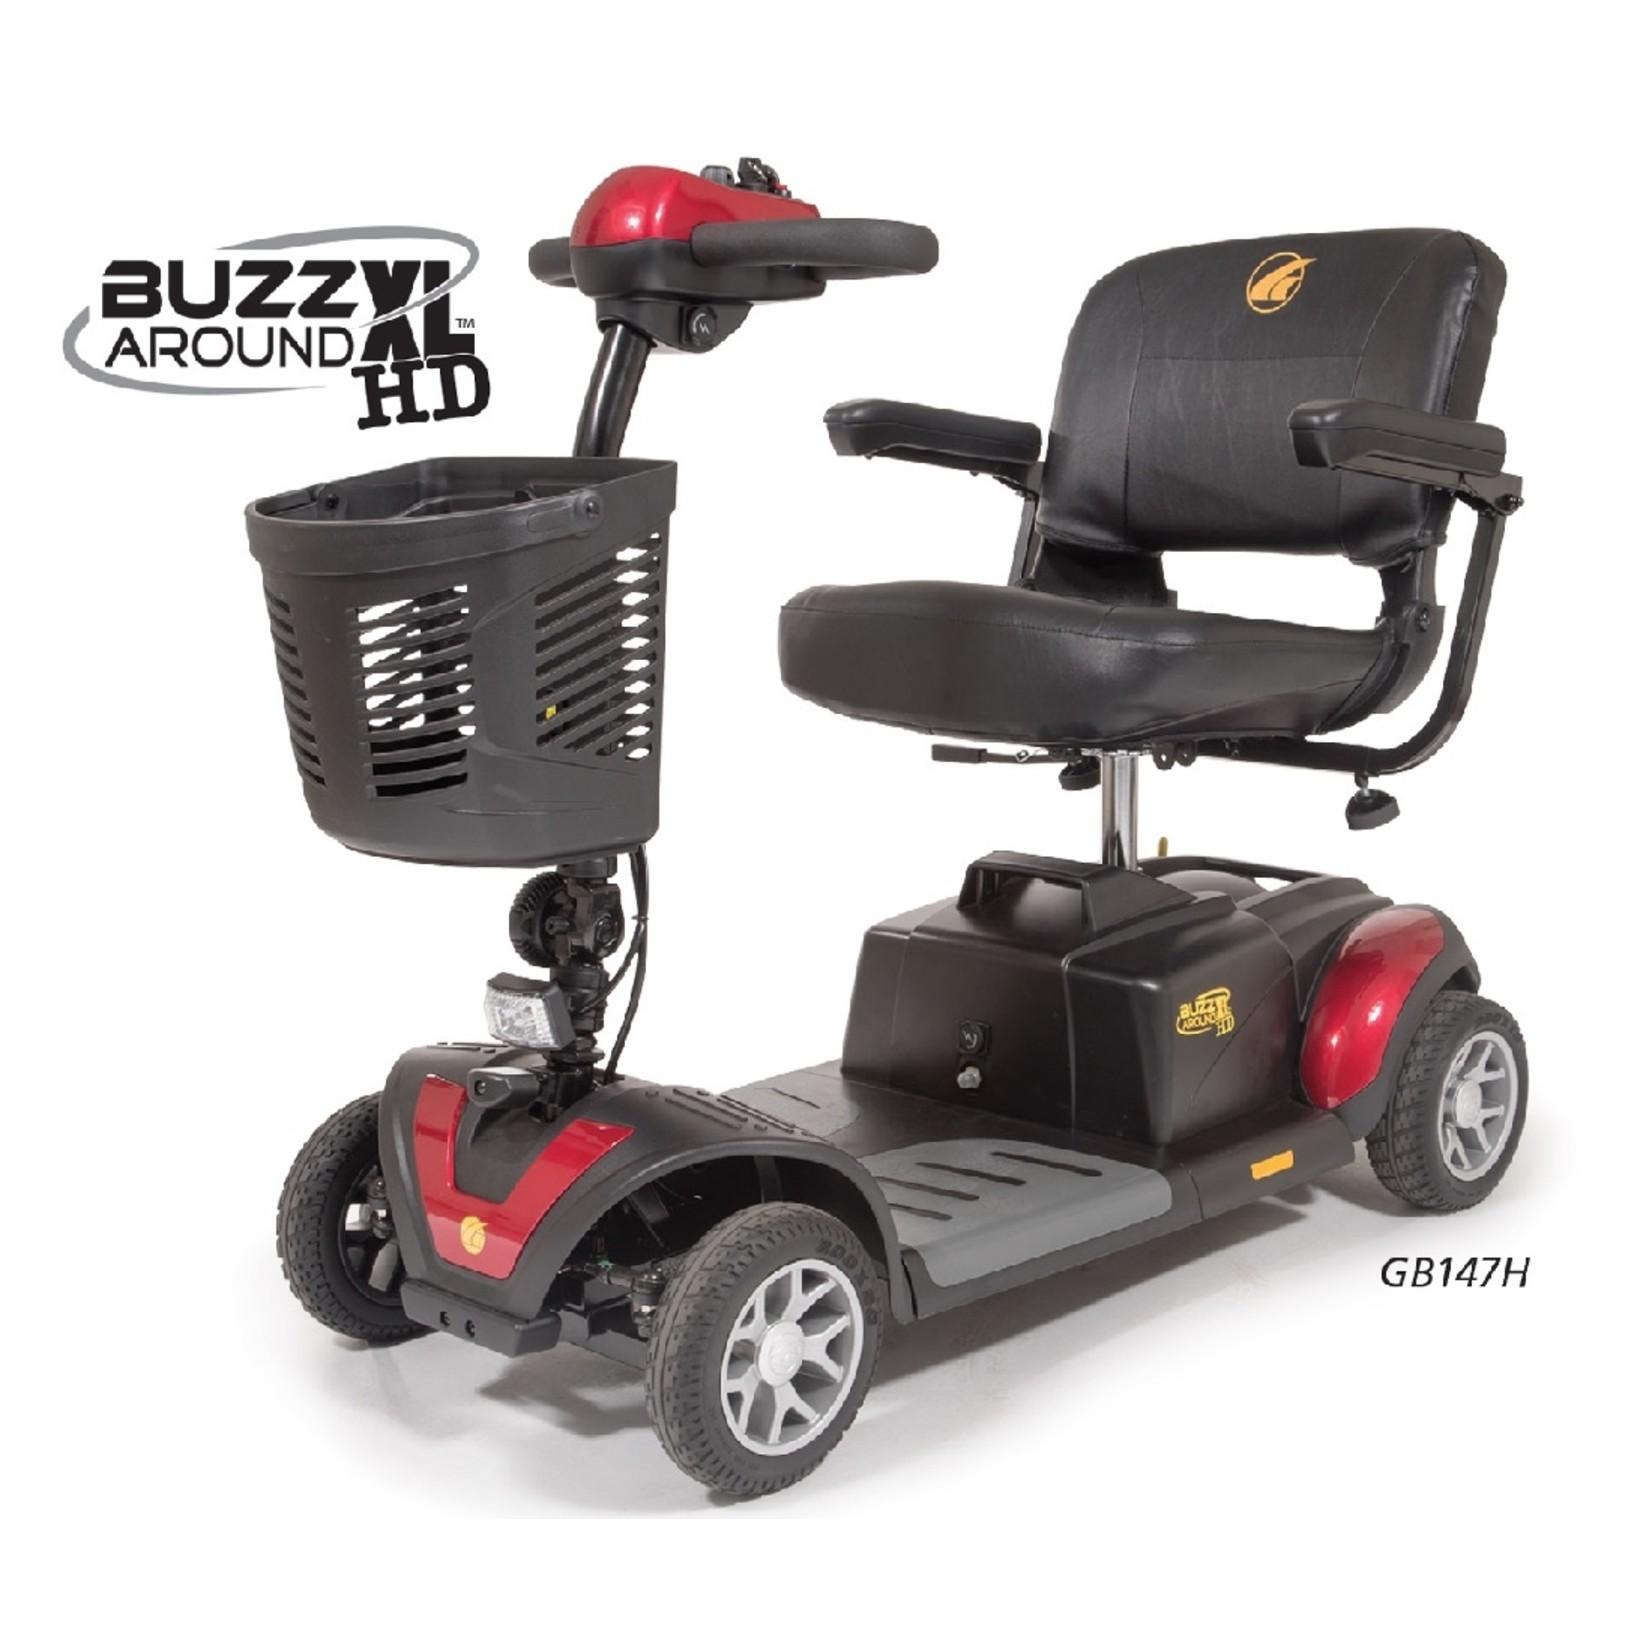 Golden Technologies Buzzaround XL - HD 4-Wheel Scooters